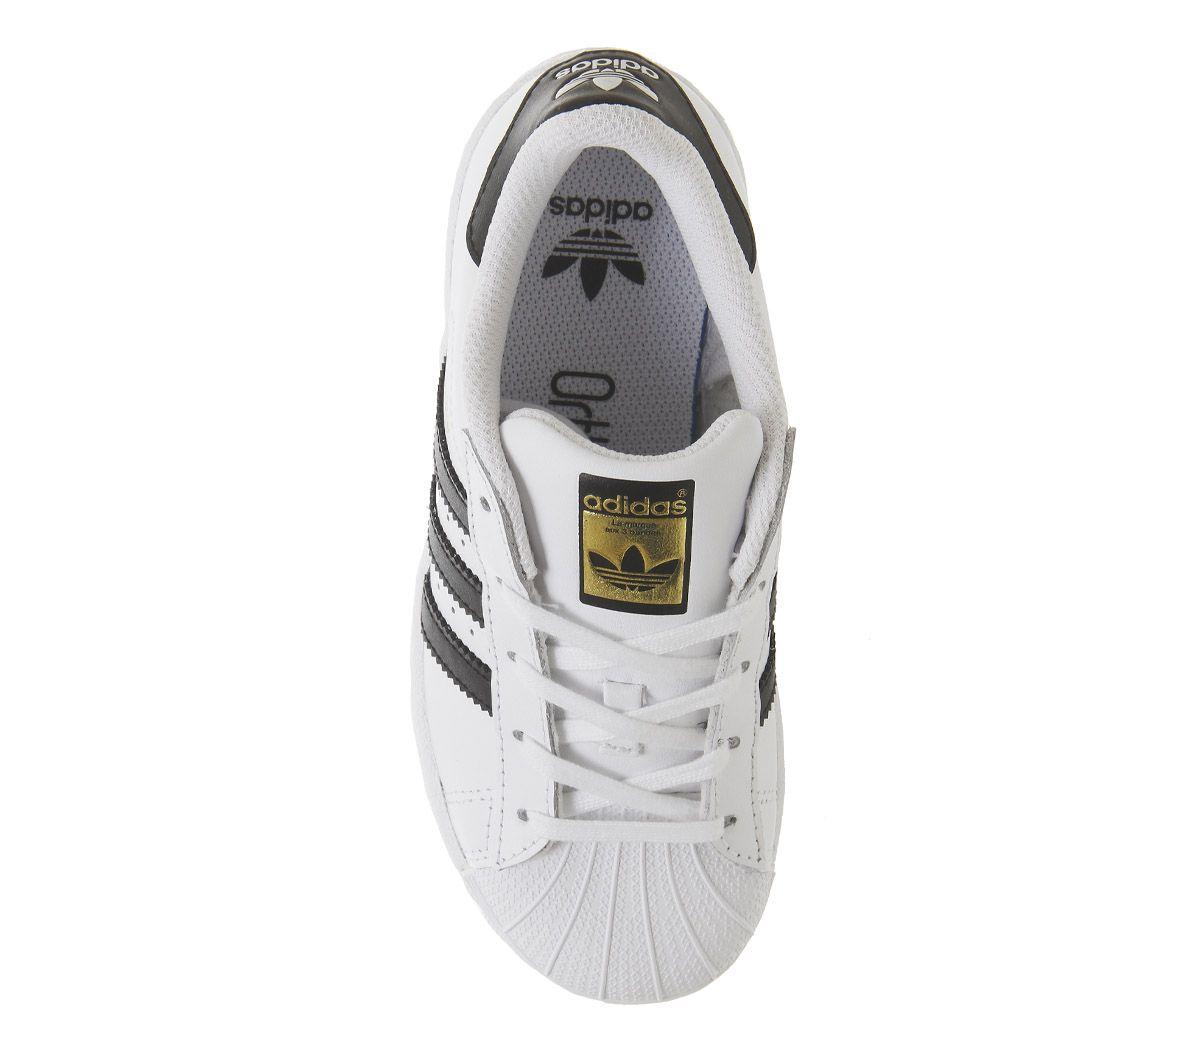 scarpe da ginnastica adidas per bambini